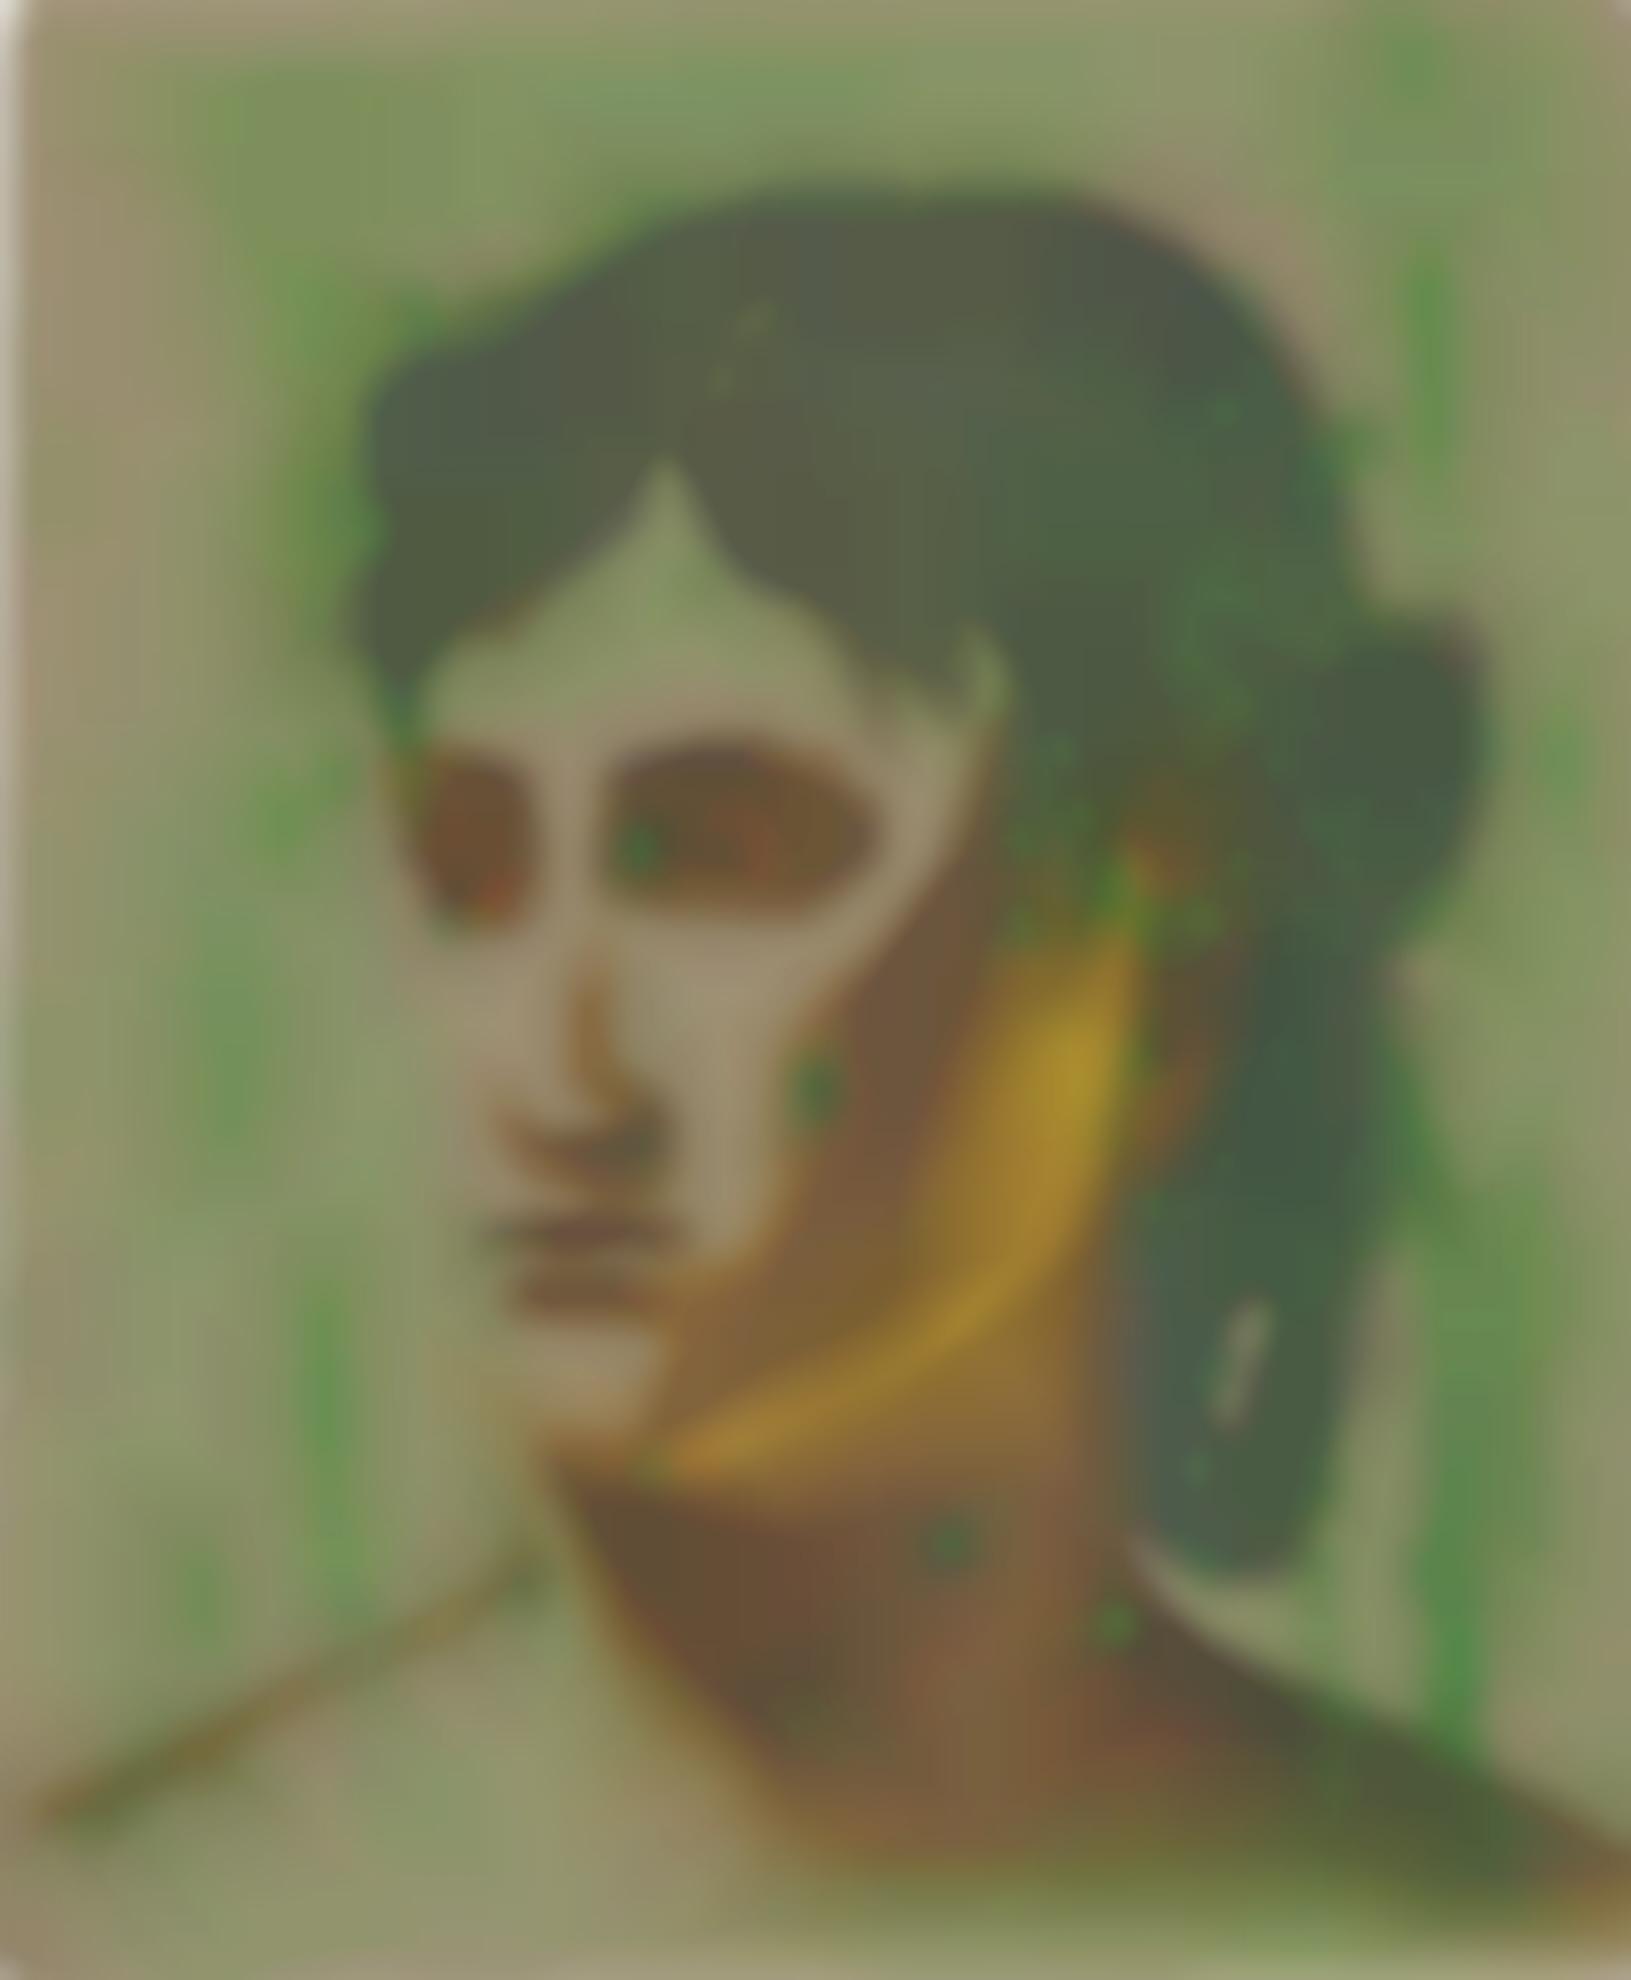 Allison Katz - No Melody Harder (Corot, Green Dots)-2007